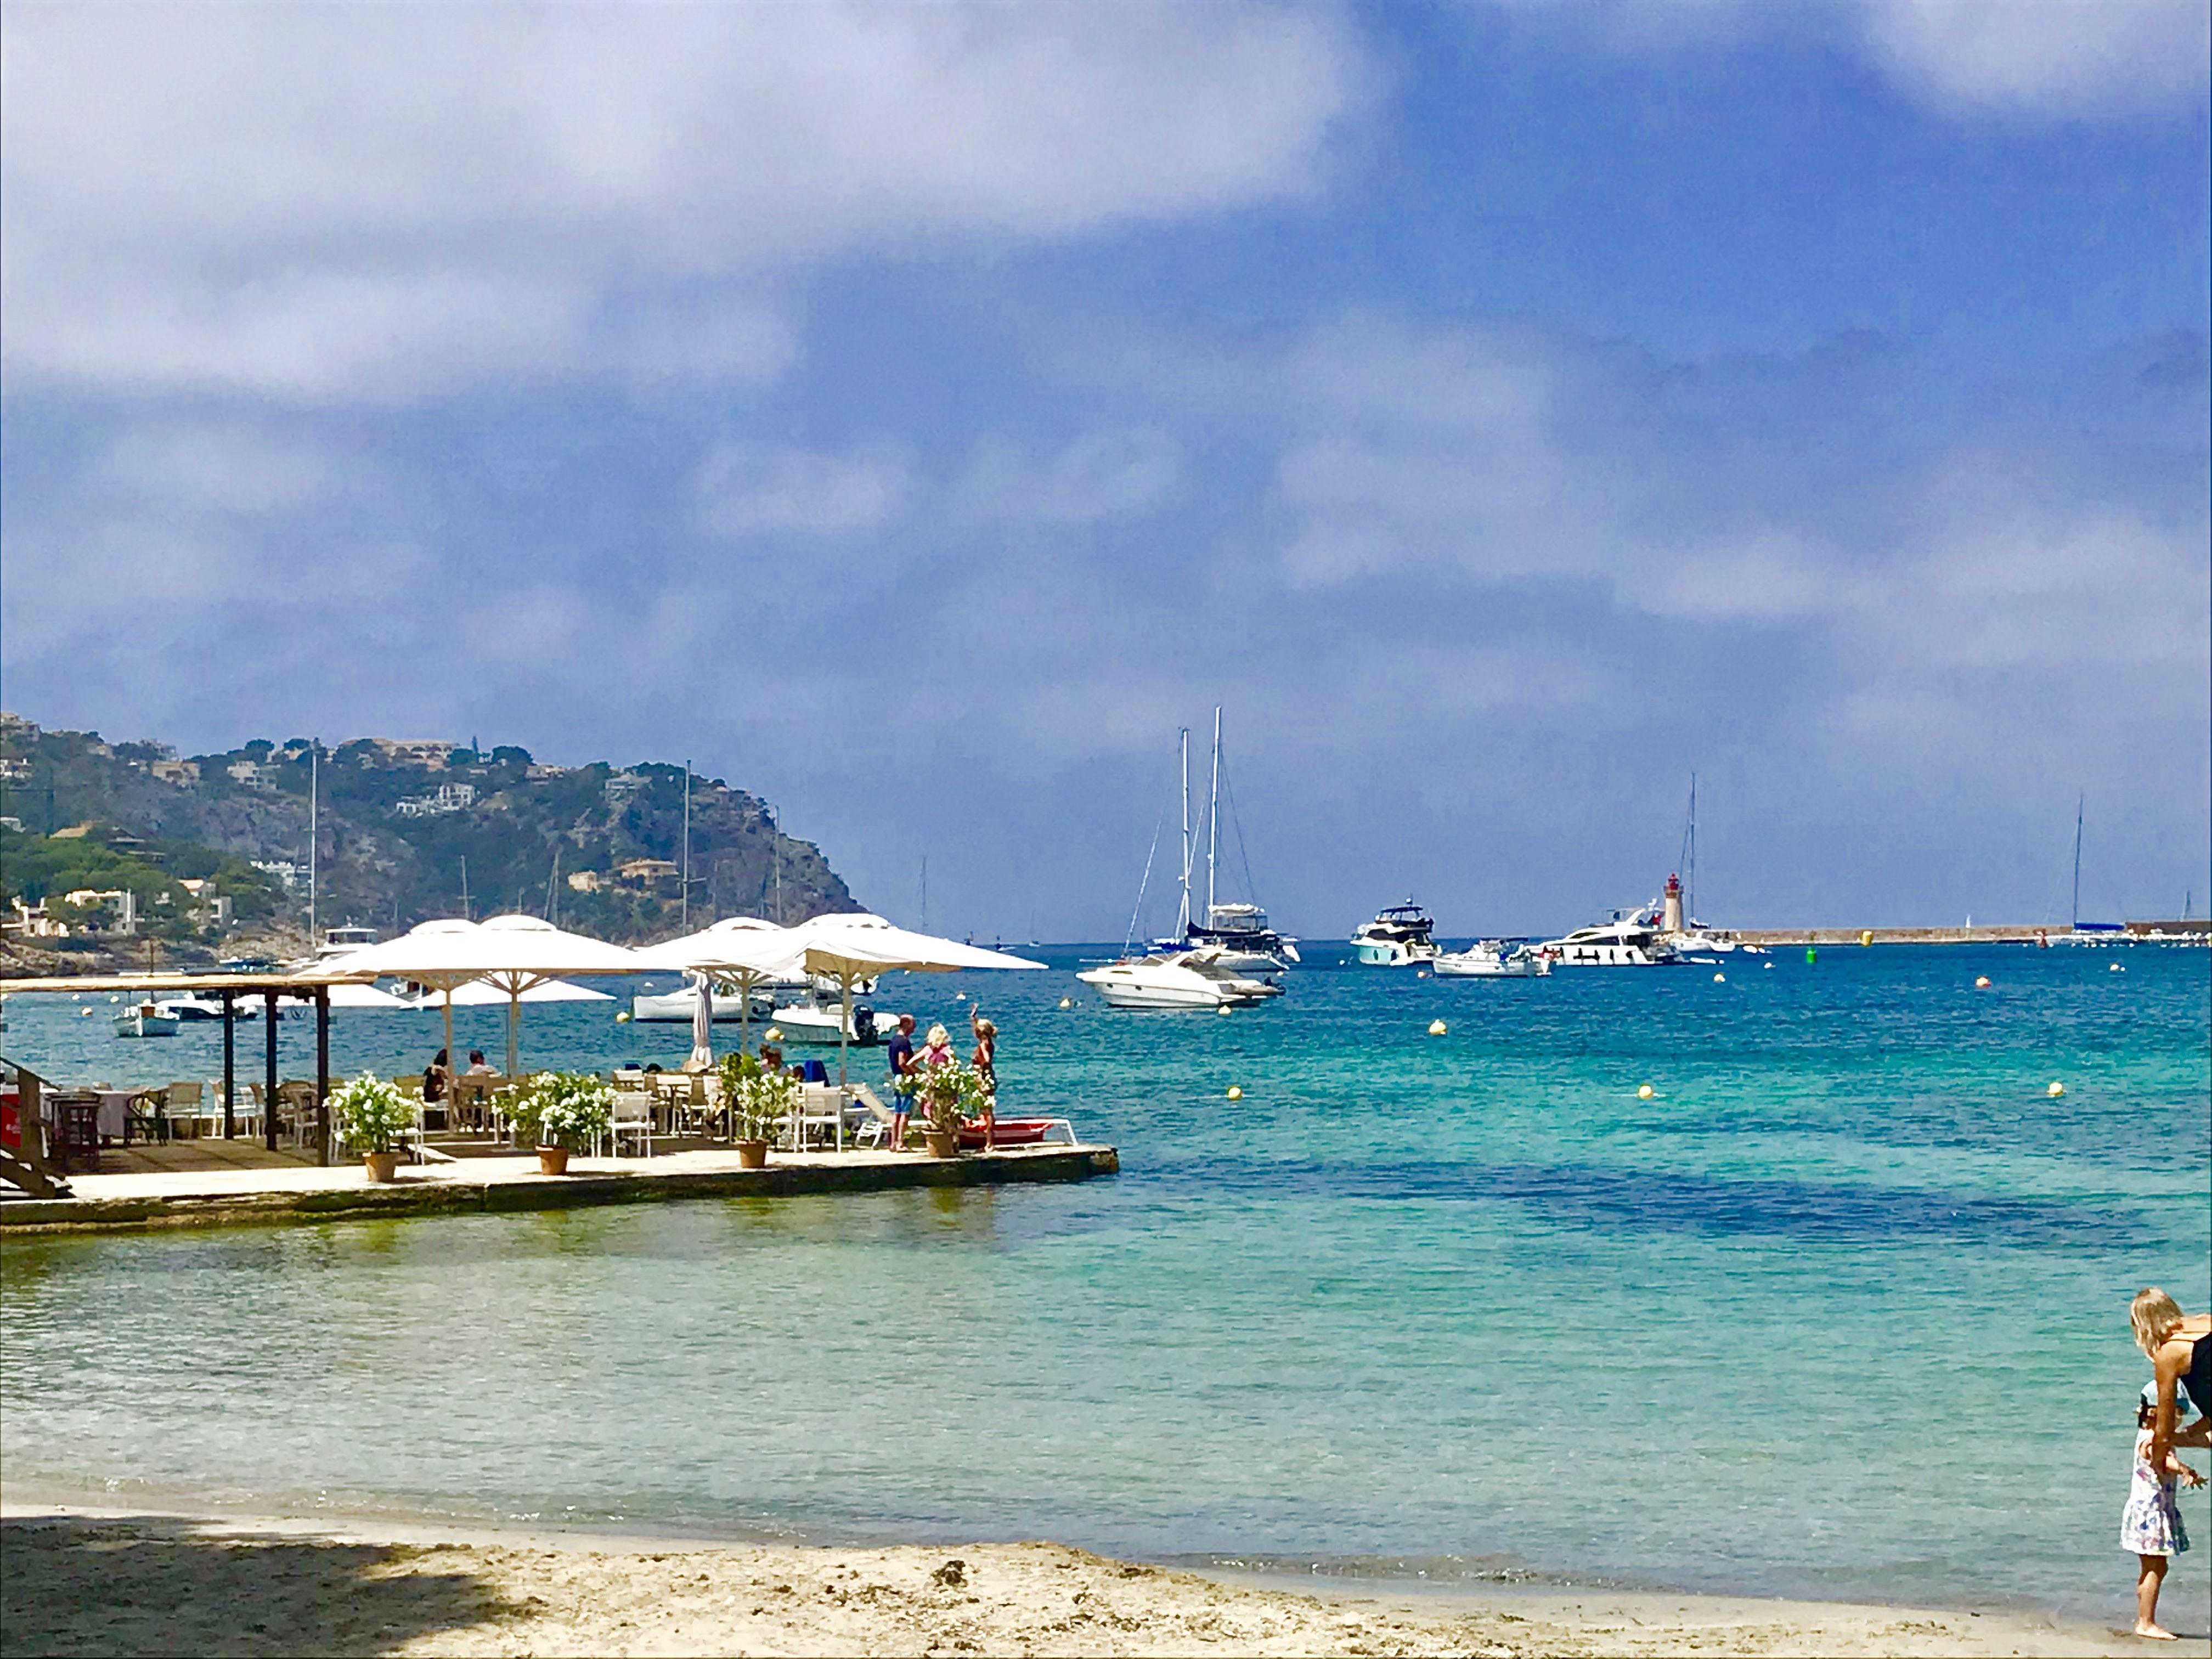 Mallorca Islas Baleares Spain C Susan Cosabb Susan Cosabb Ph Www Sucosabb Com Mallorca Places To Go Spain